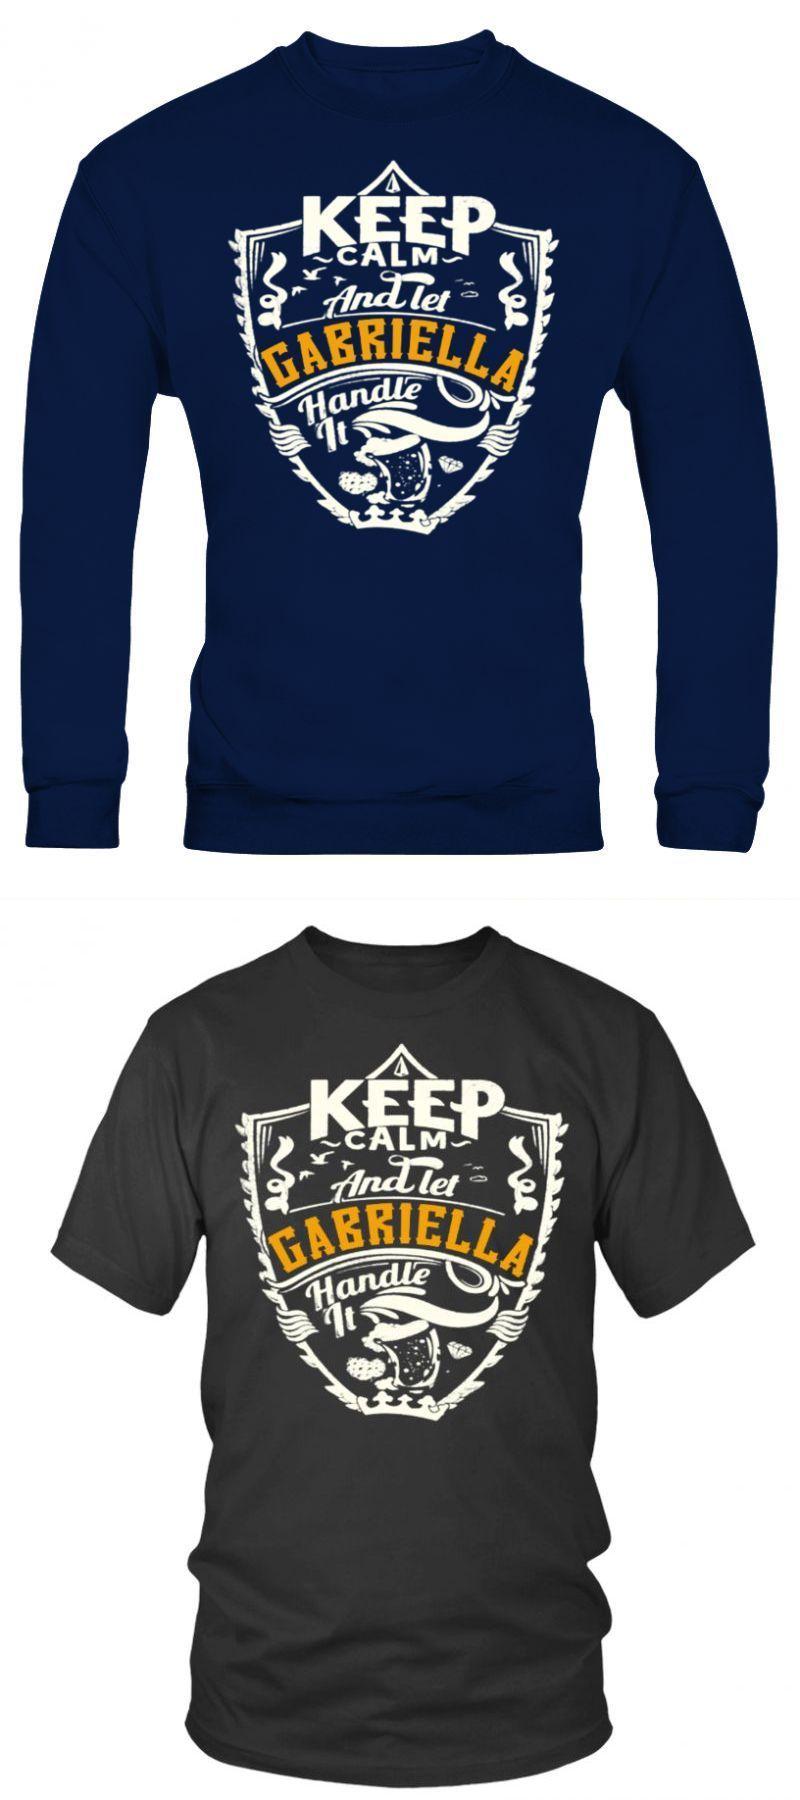 Volleyball T Shirts Design Ideas Valoblogi Com